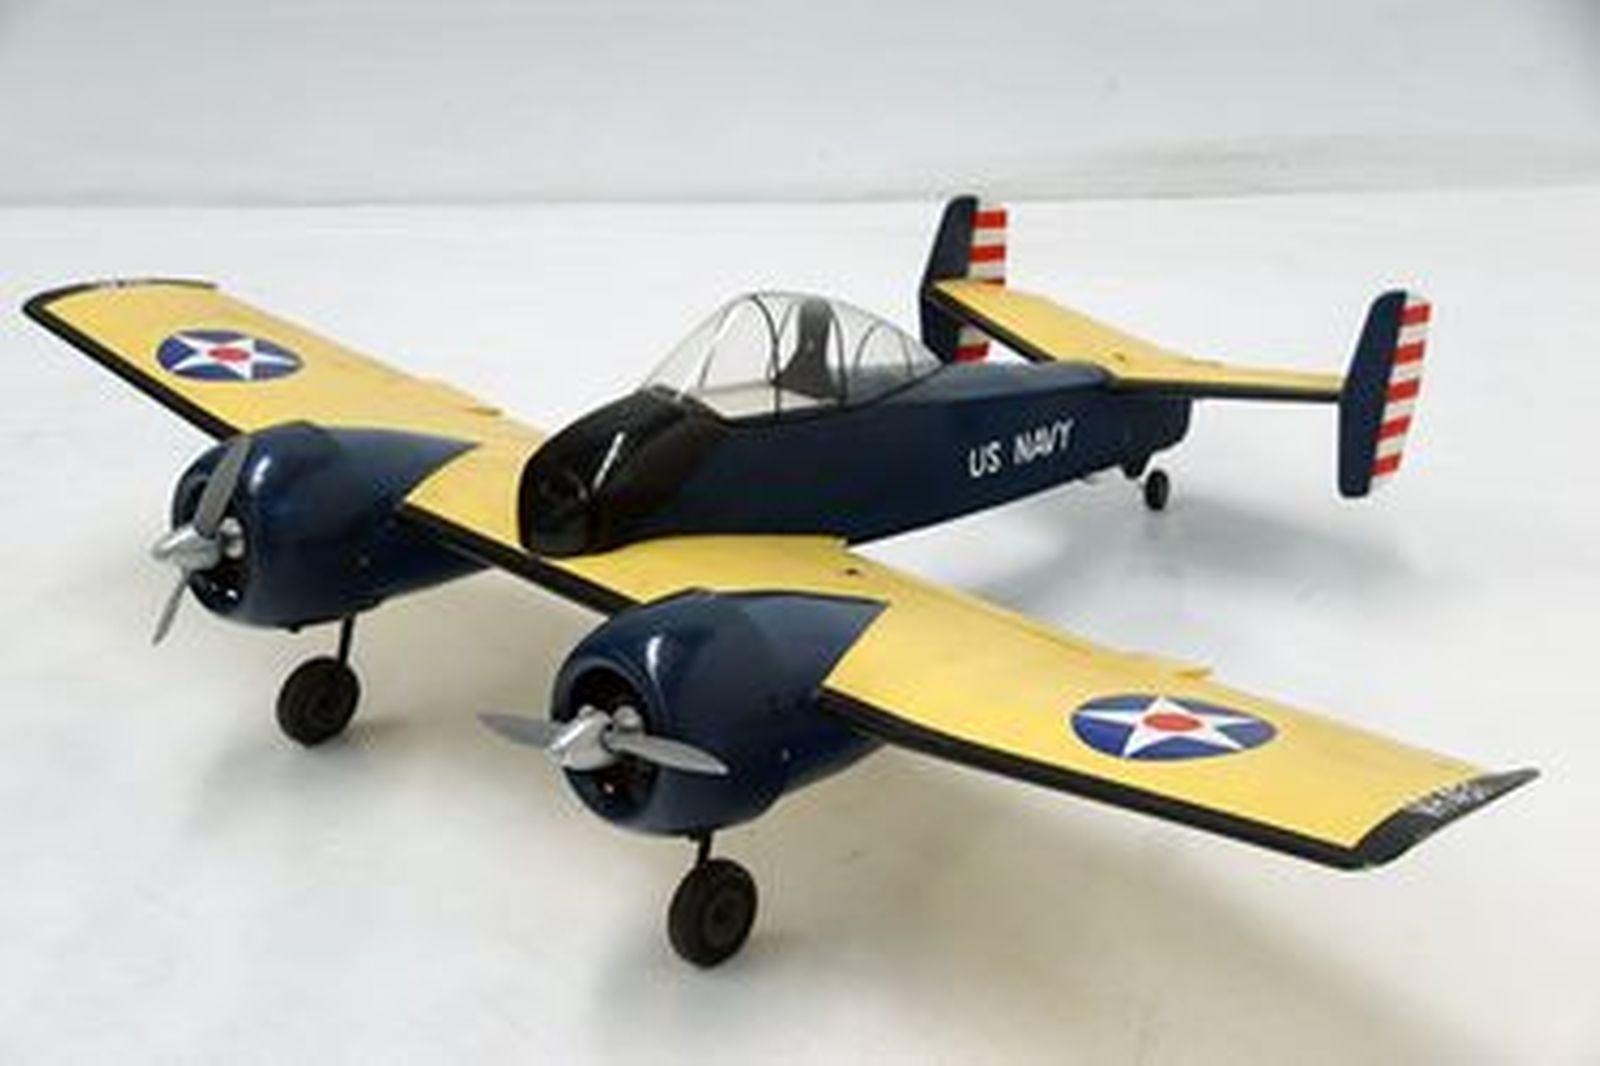 Model Plane - Grumman Twin Motor CF5F Skyrocket Shipborne US Navy Fighter